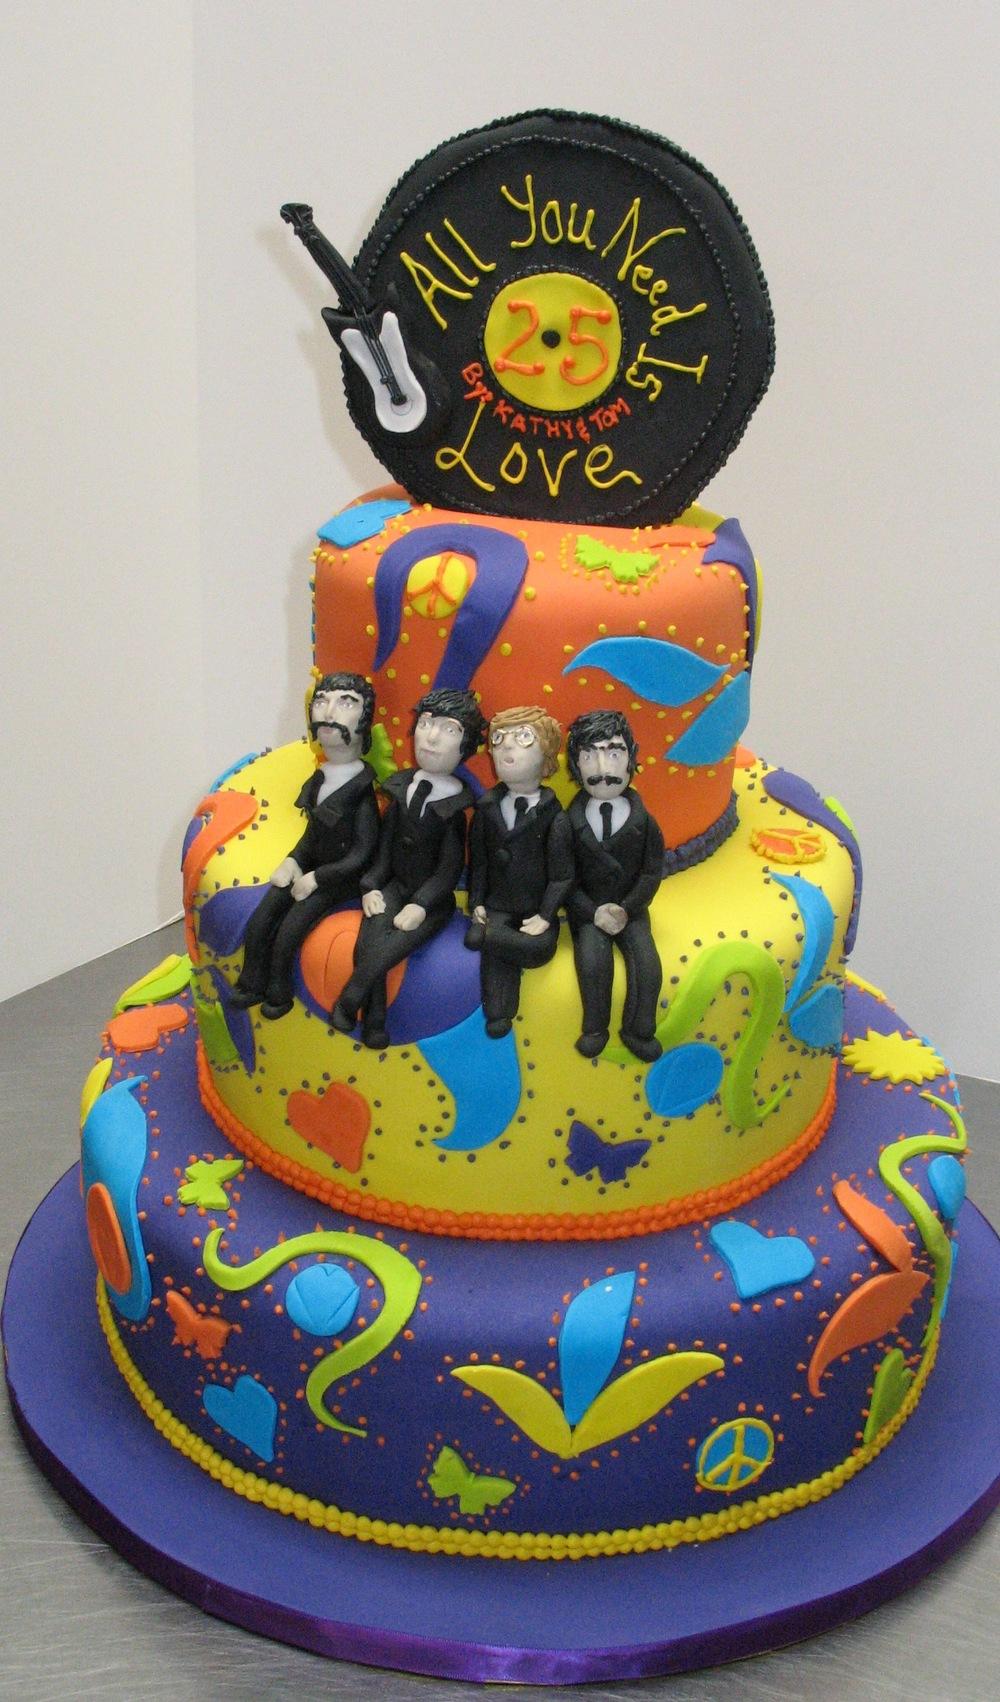 Beatle's cake